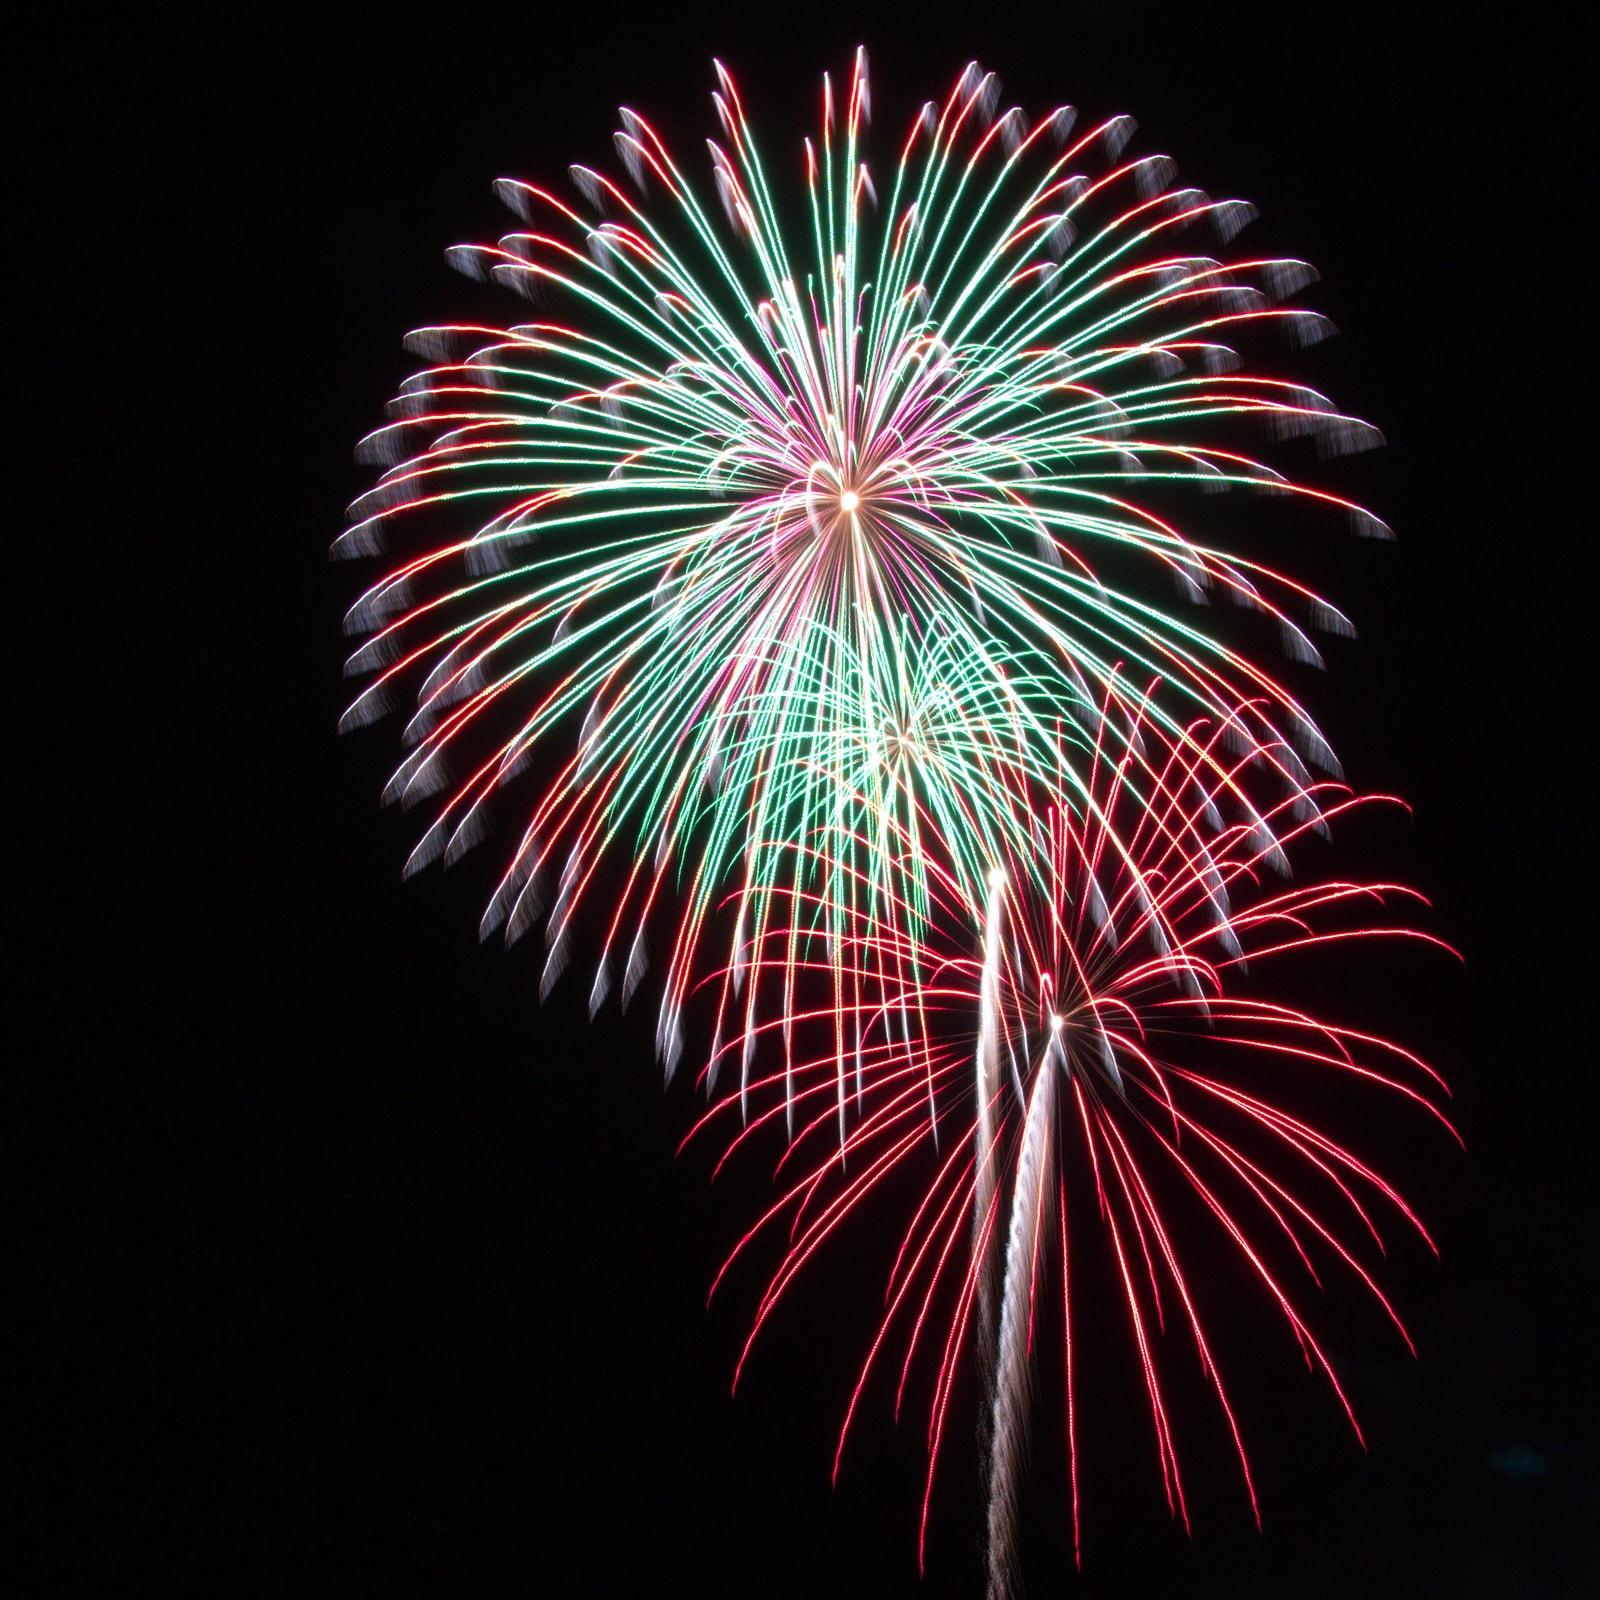 Massachusetts Fireworks: green and red bursts